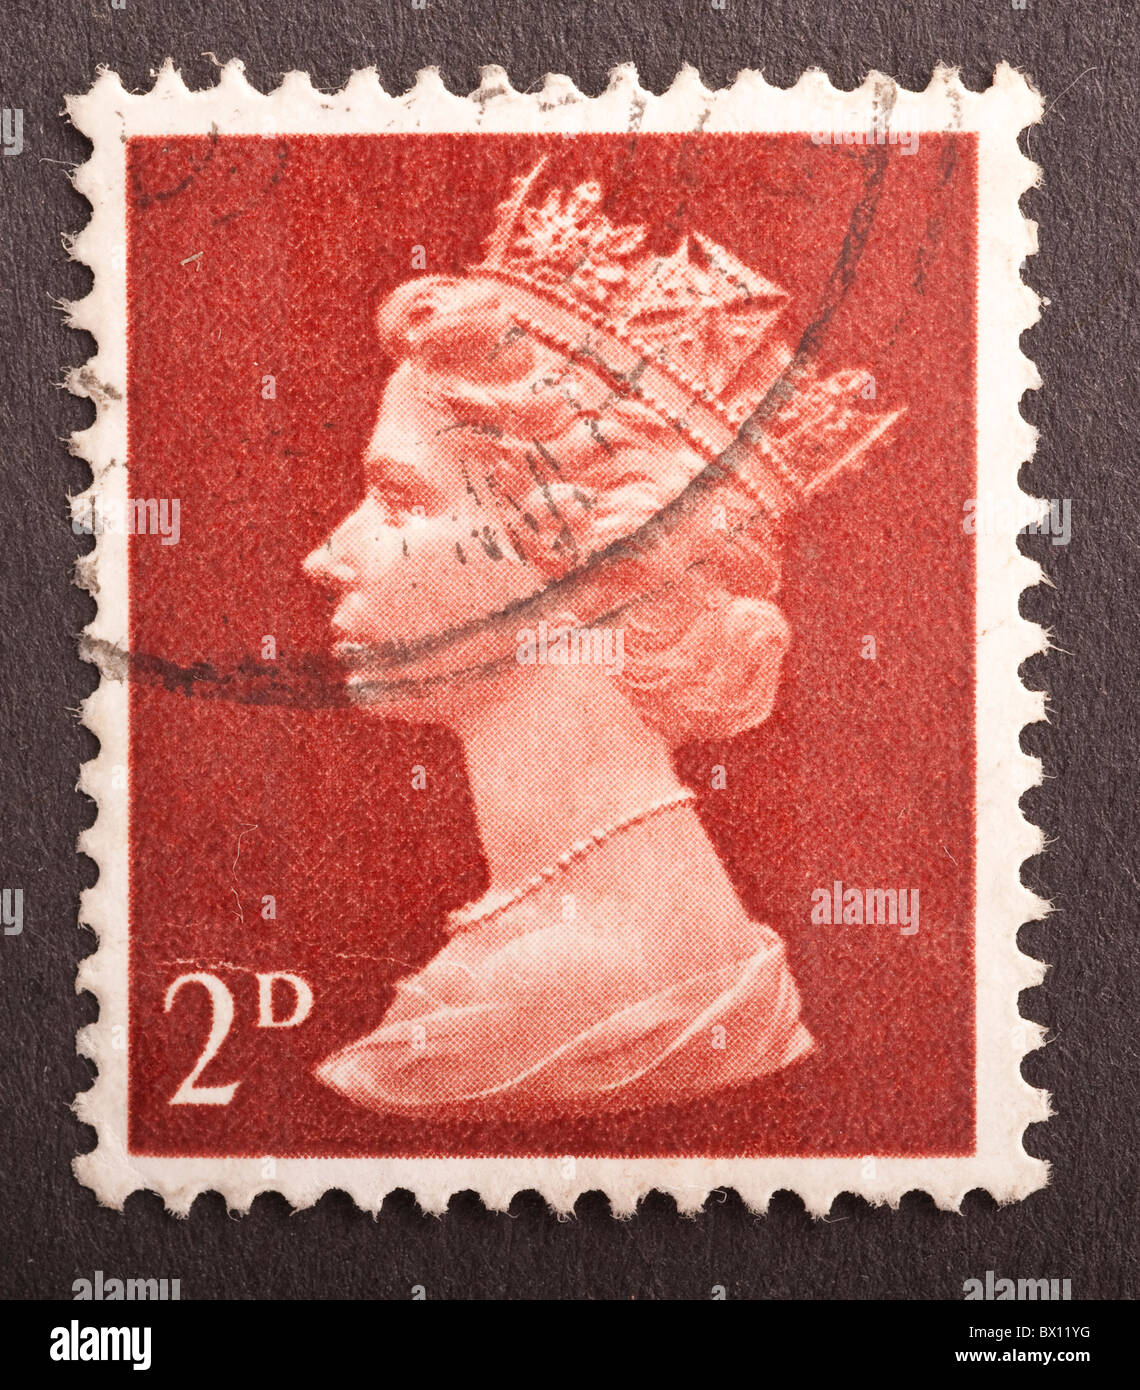 United Kingdom Postage Stamp 2d, Machin - Stock Image